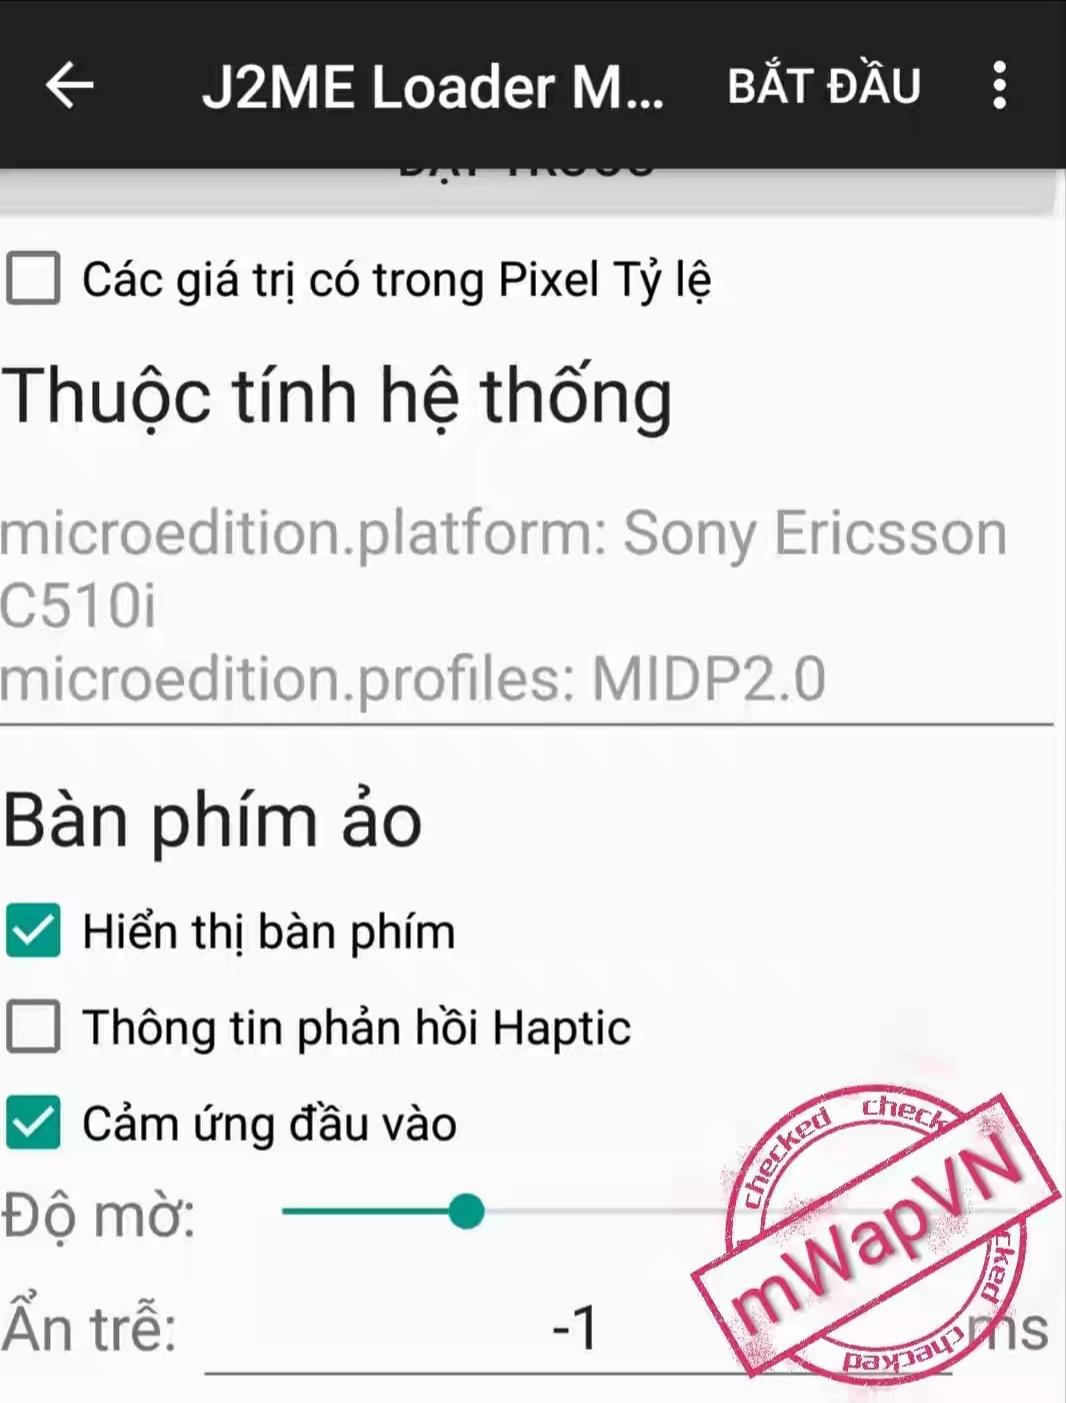 mWapVN - Wap xem truyện tranh, tải game mobile, blog tin tức,share